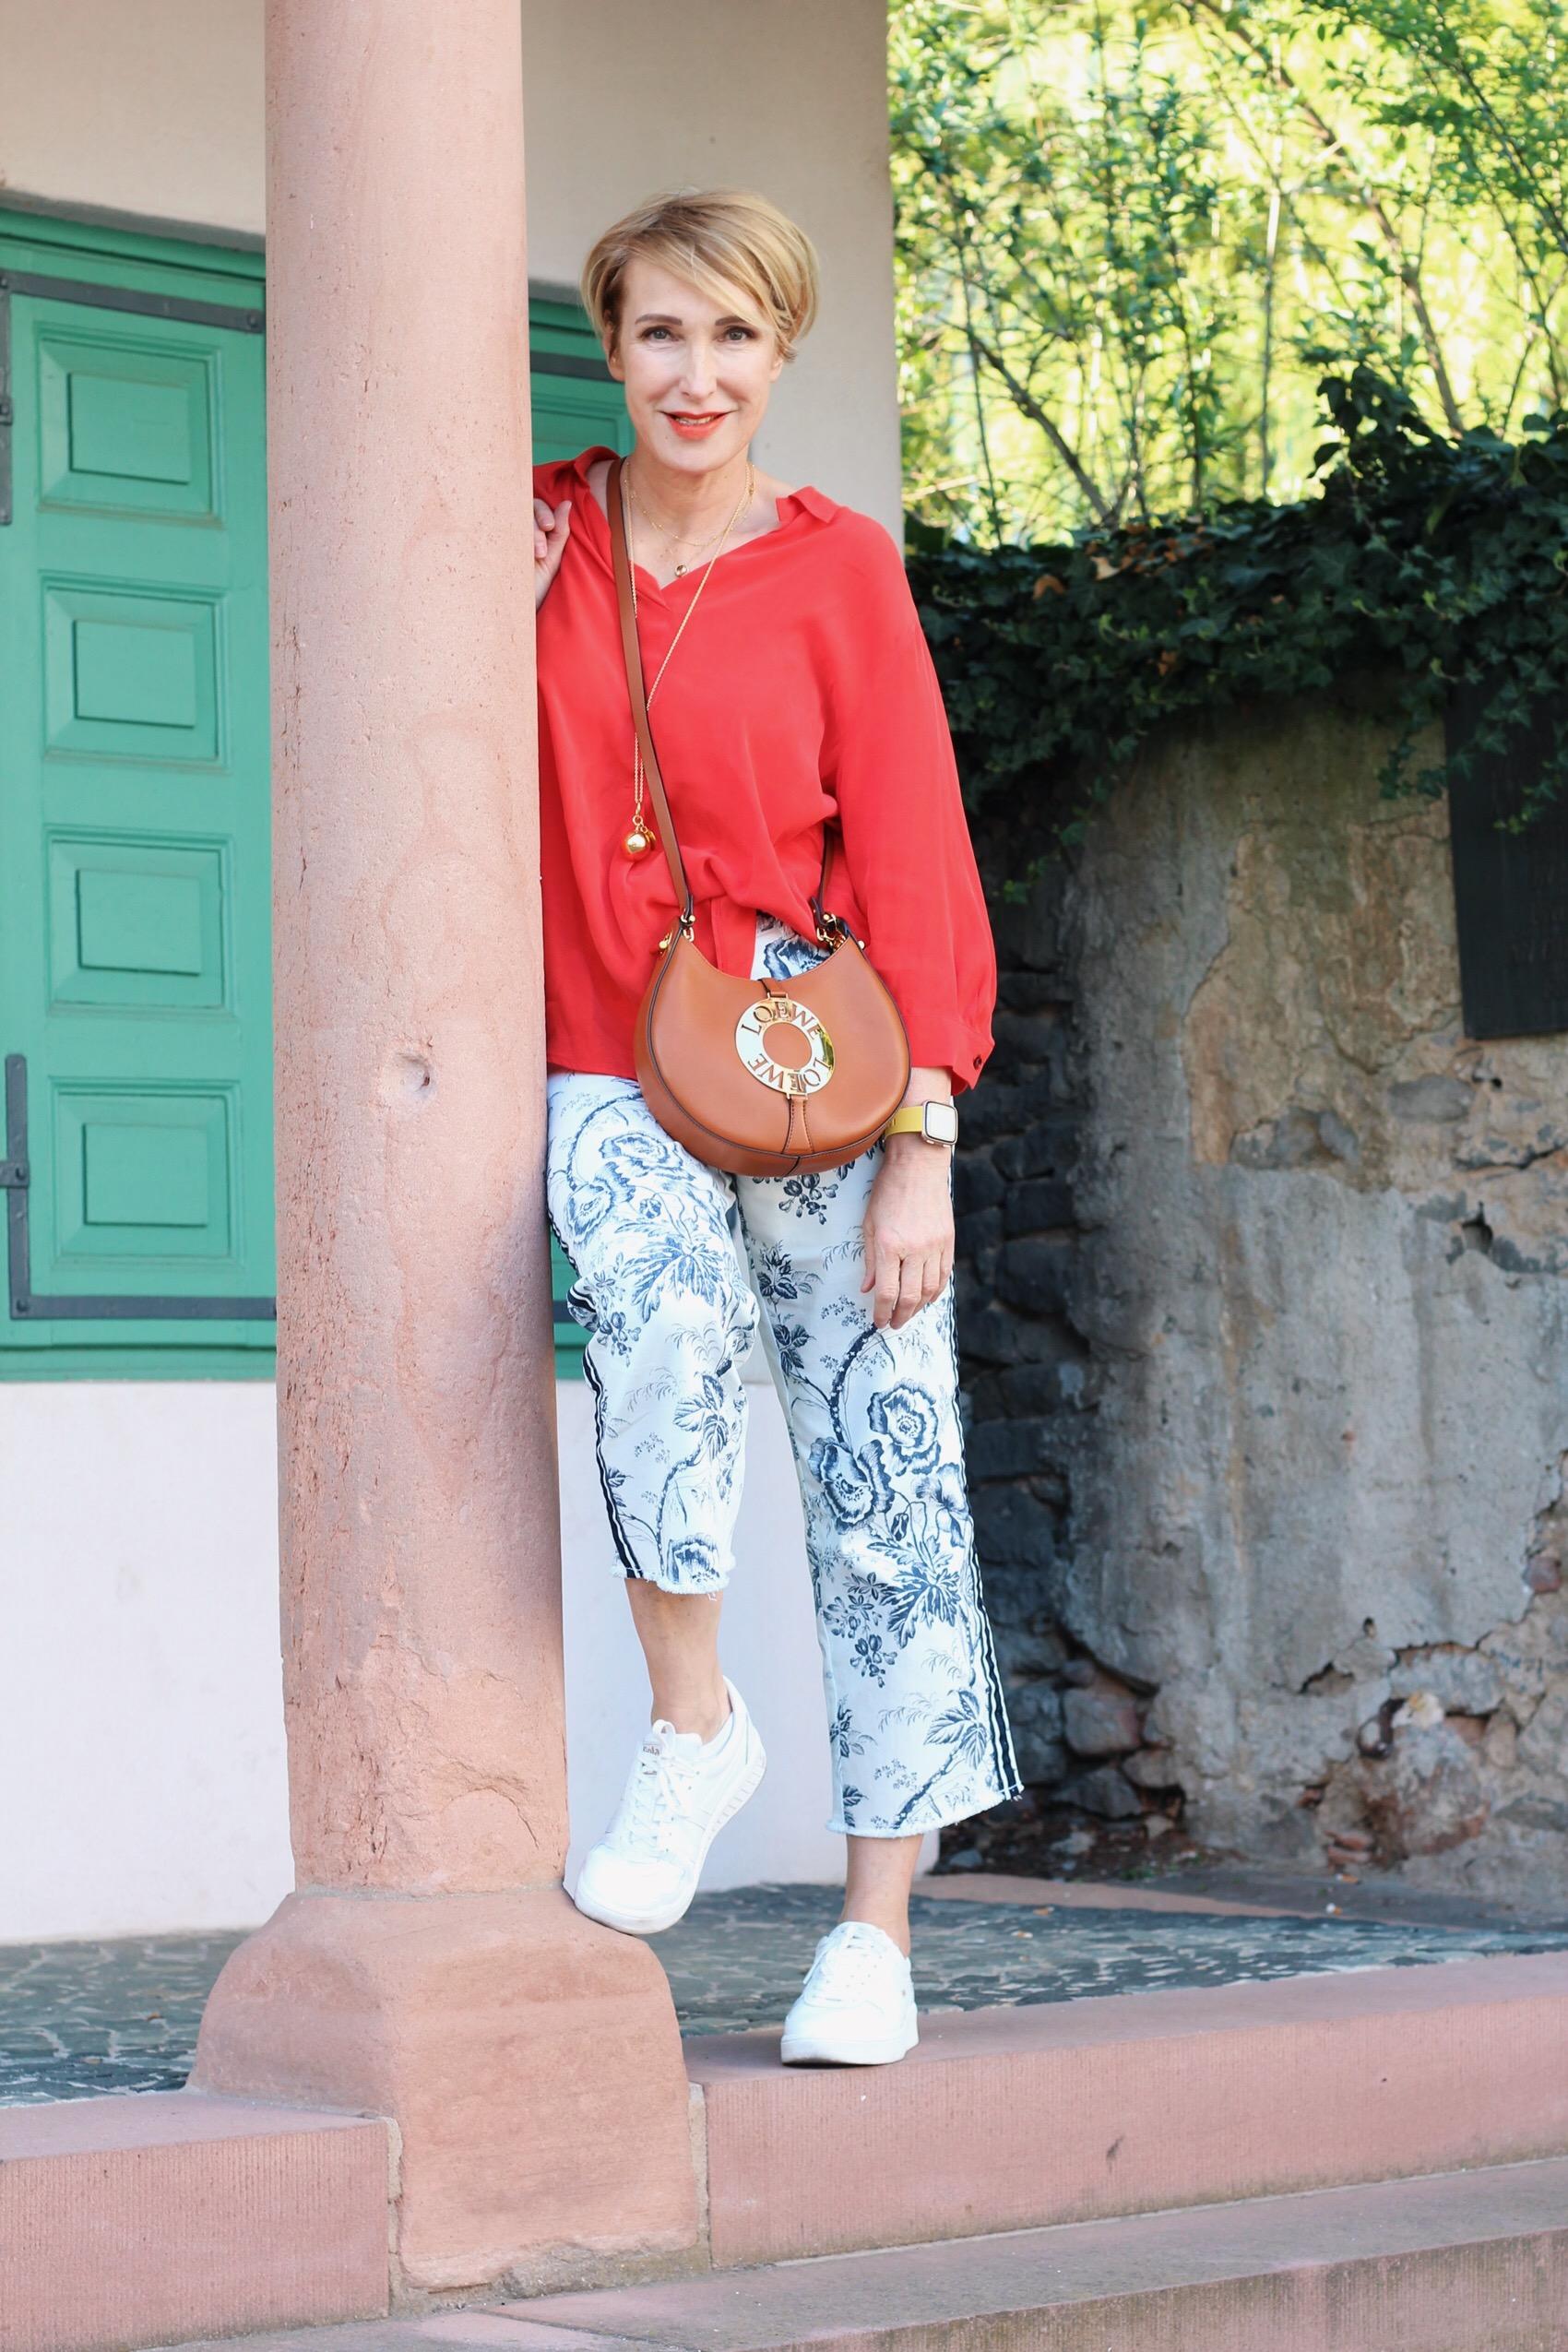 glamupyourlifestyle toni toni-fashion gut-sitzende-hosen Frühlings-Outfit ü-40-blog ü-50-blog ue-40-blog ue-50-blog